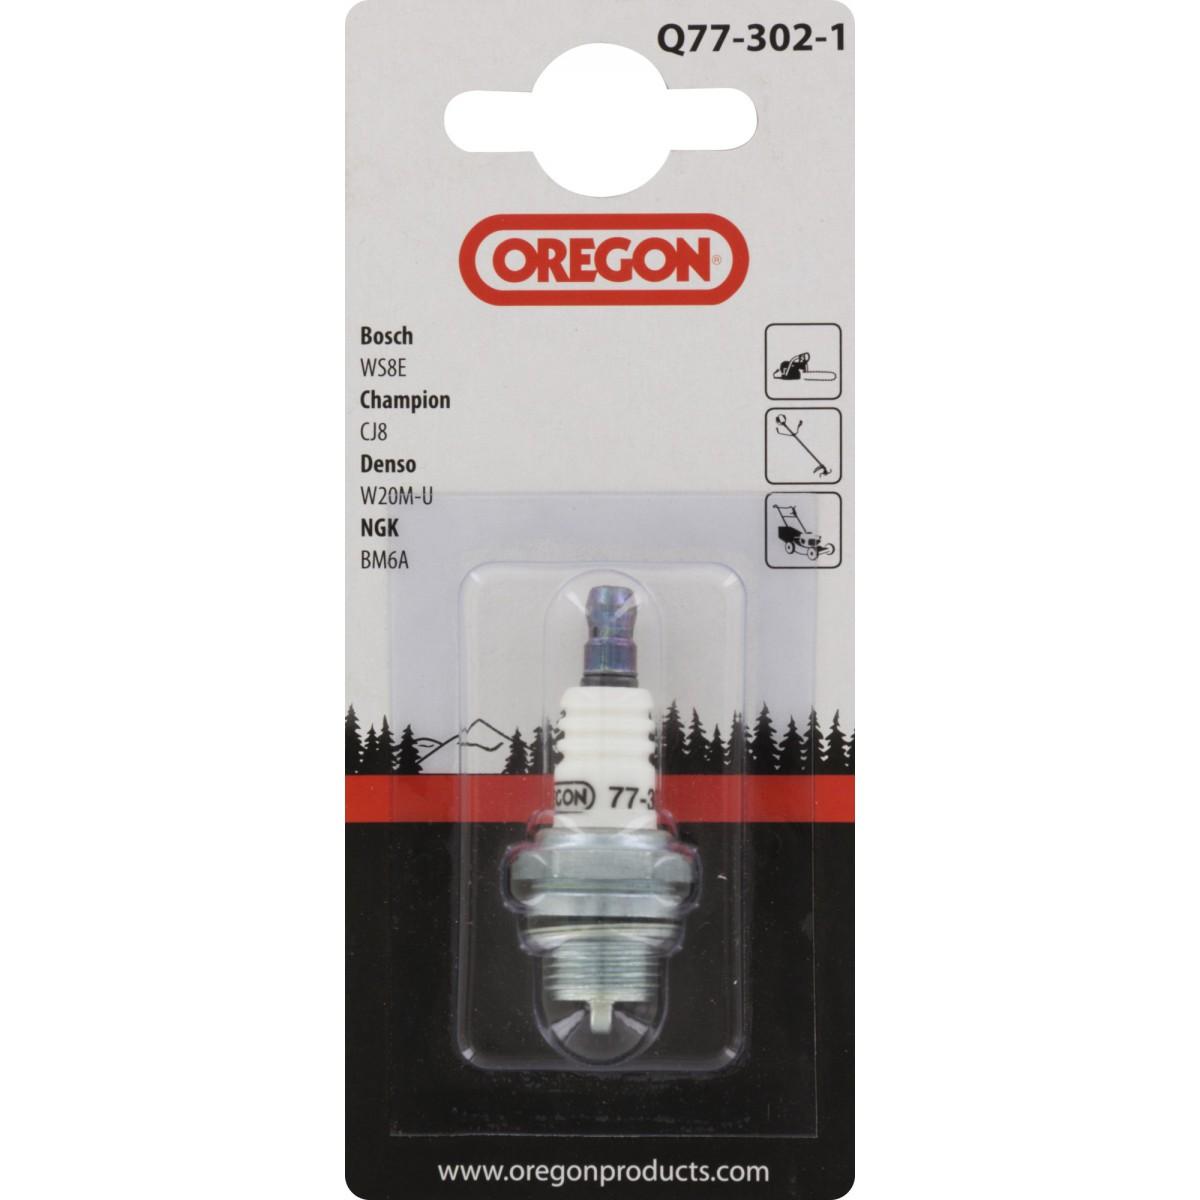 Bougie d'allumage Oregon - Q77-302-1